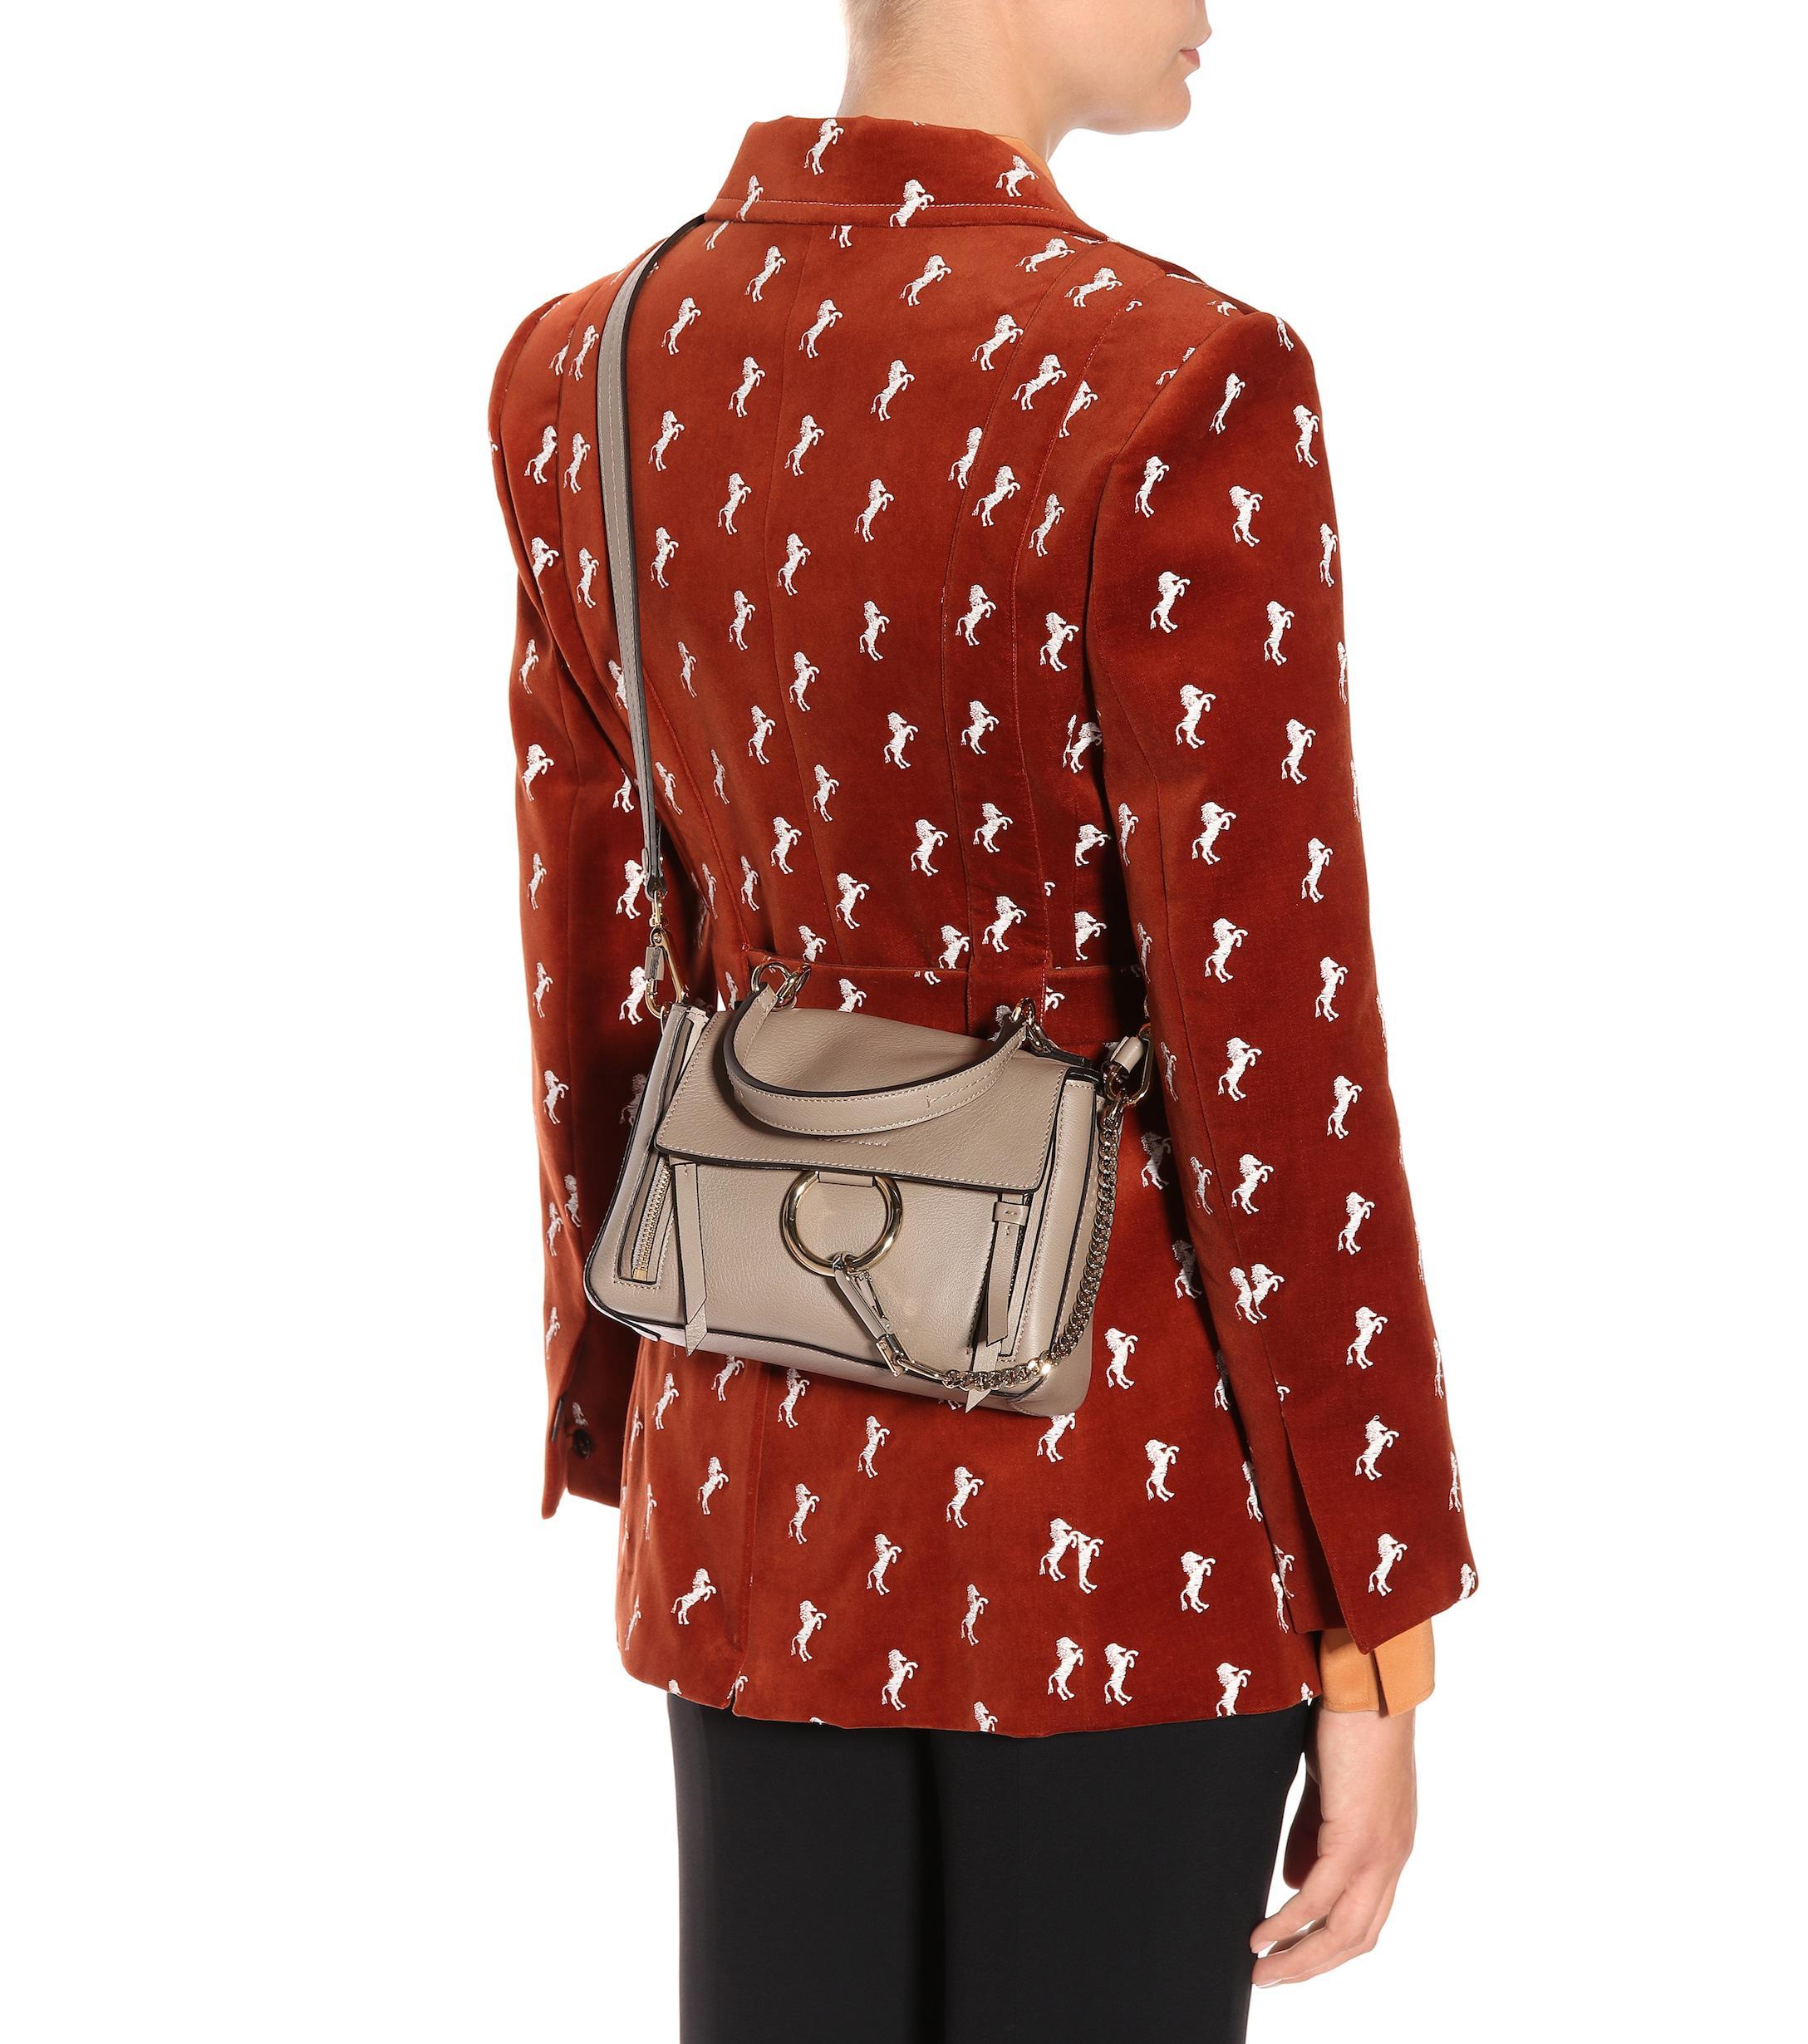 744f37c00 Chloé Mini Faye Day Leather Shoulder Bag - Lyst